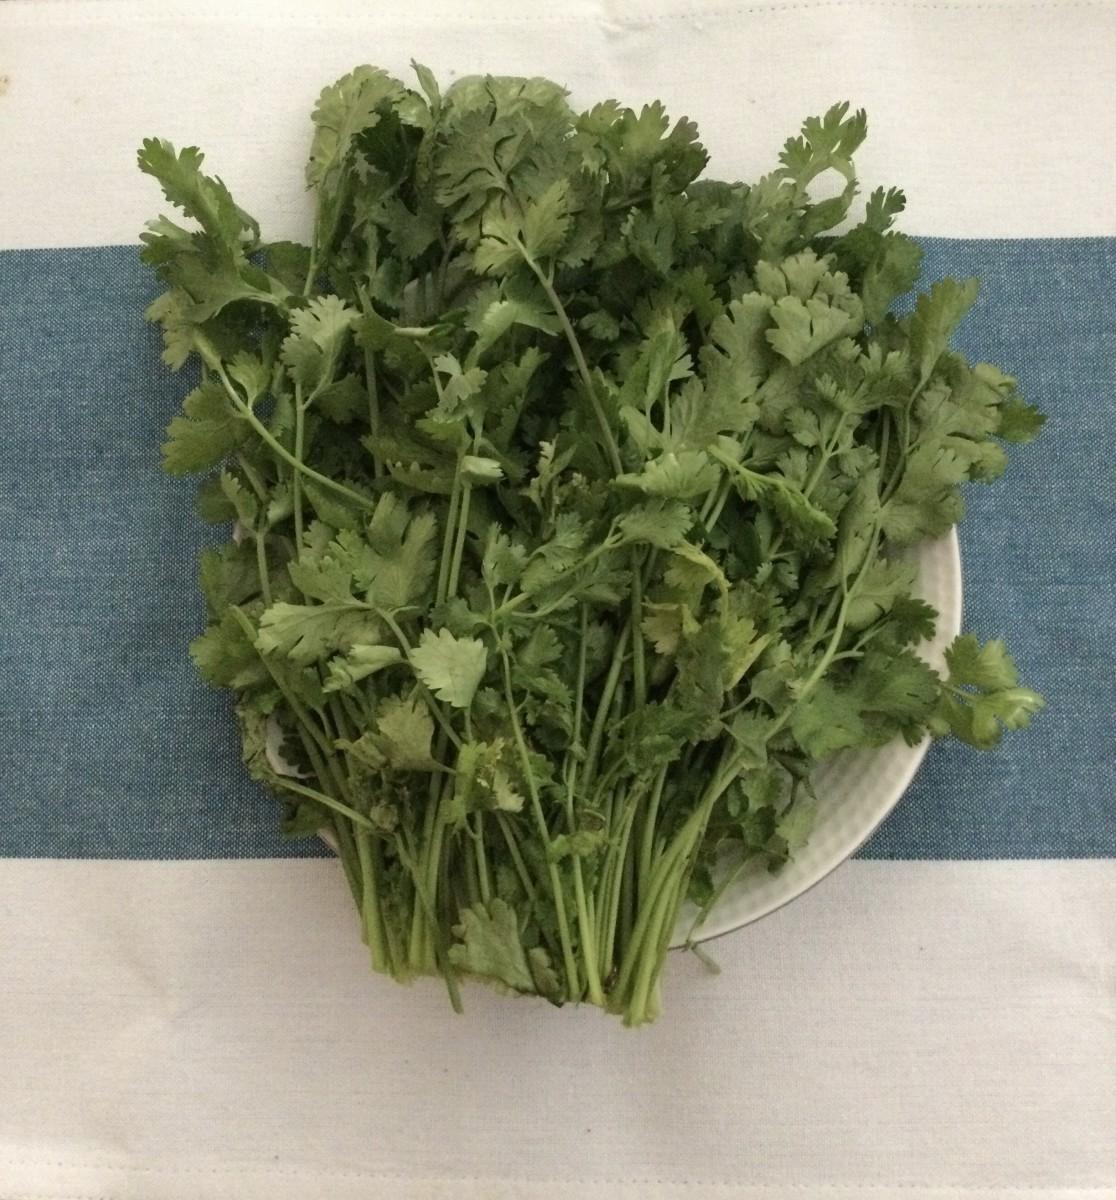 My own home grown Coriander herb